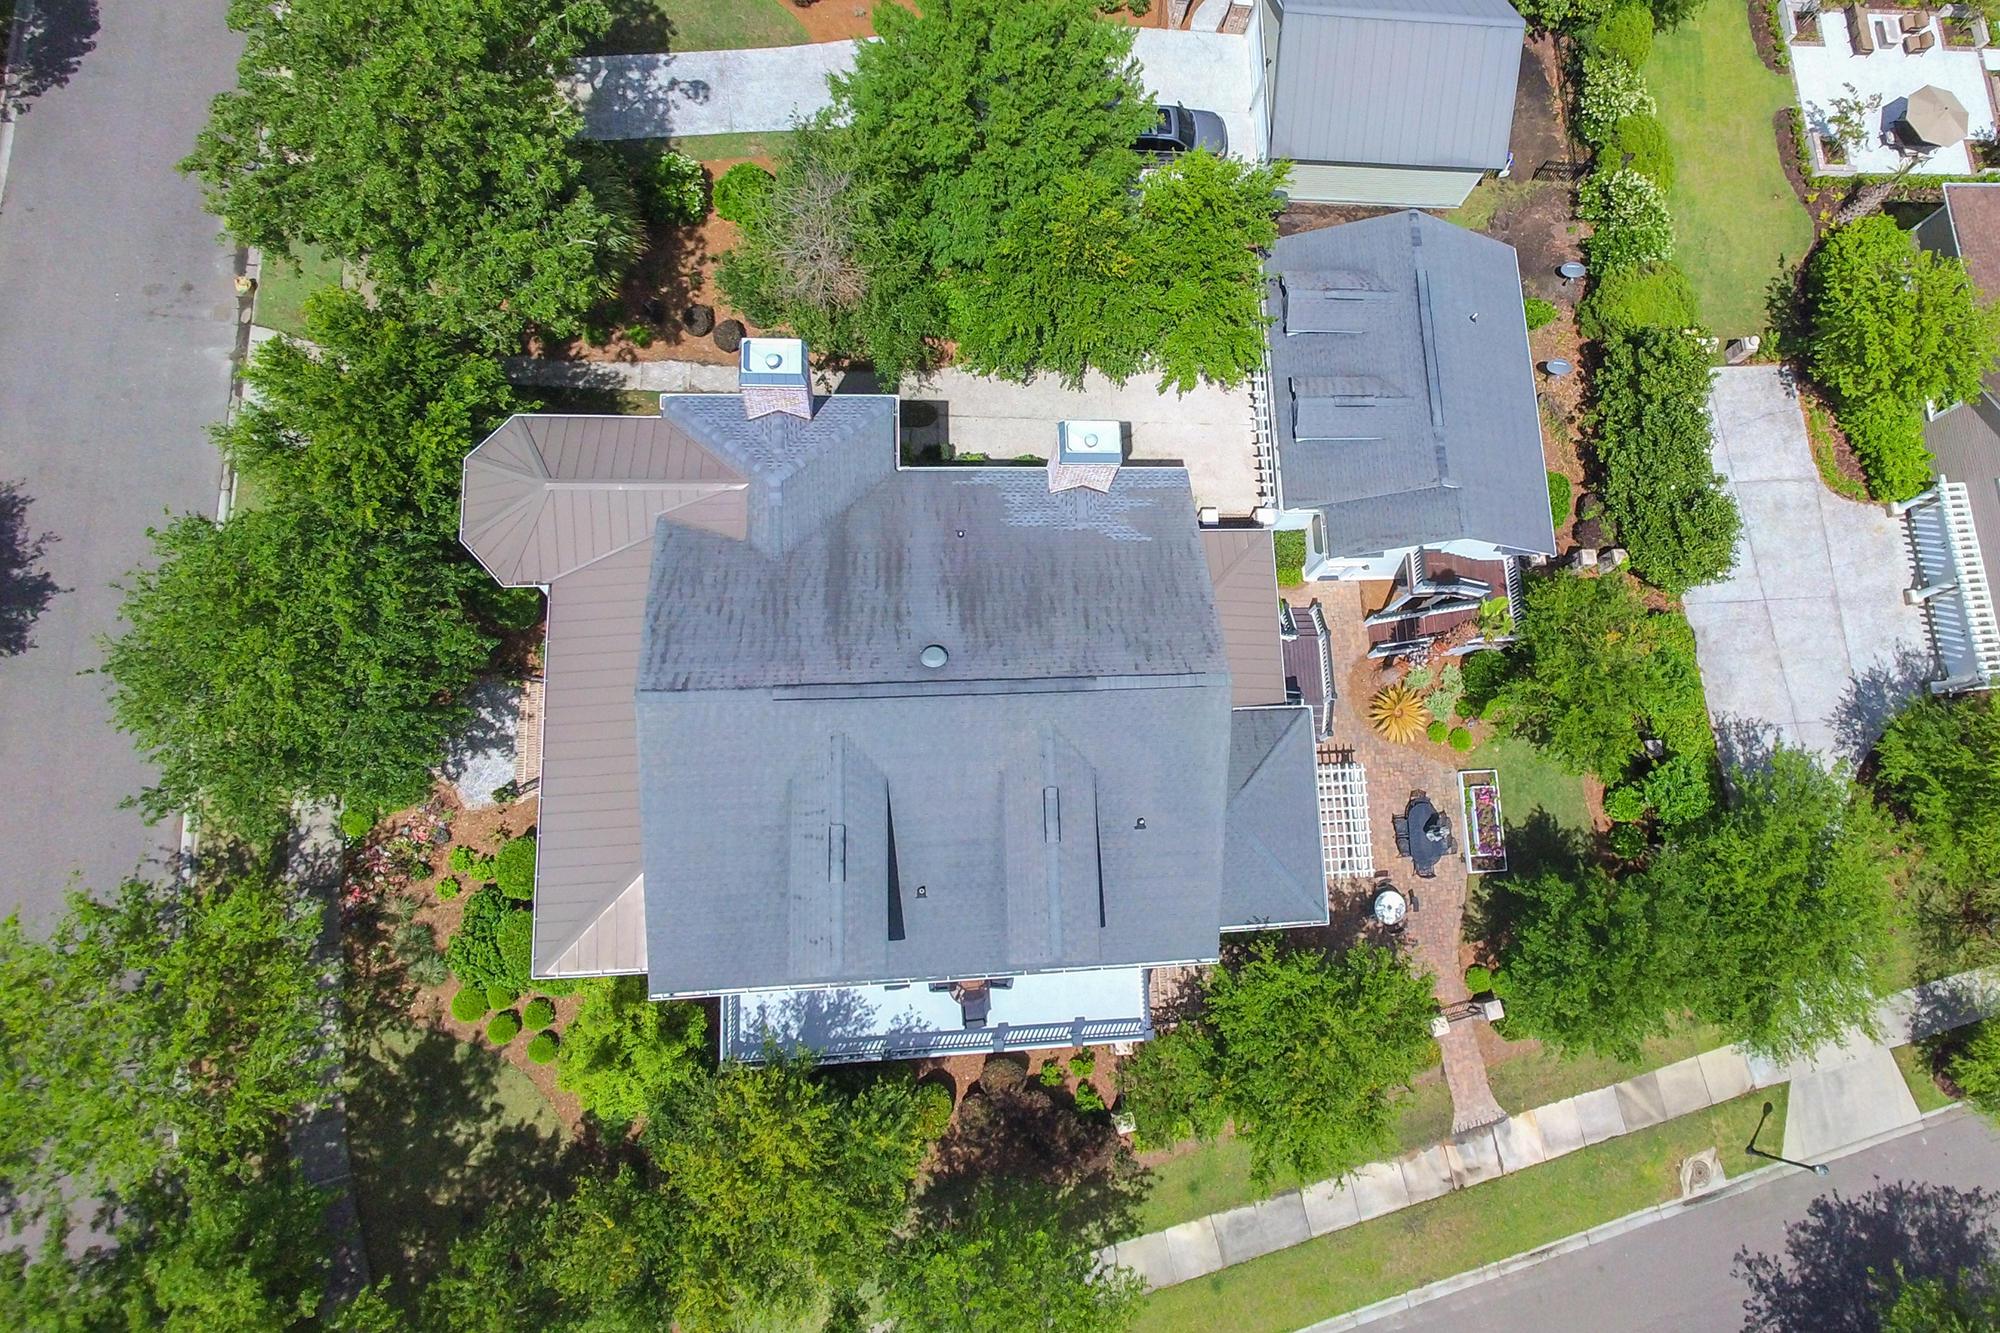 Daniel Island Park Homes For Sale - 1 Lafar, Daniel Island, SC - 59